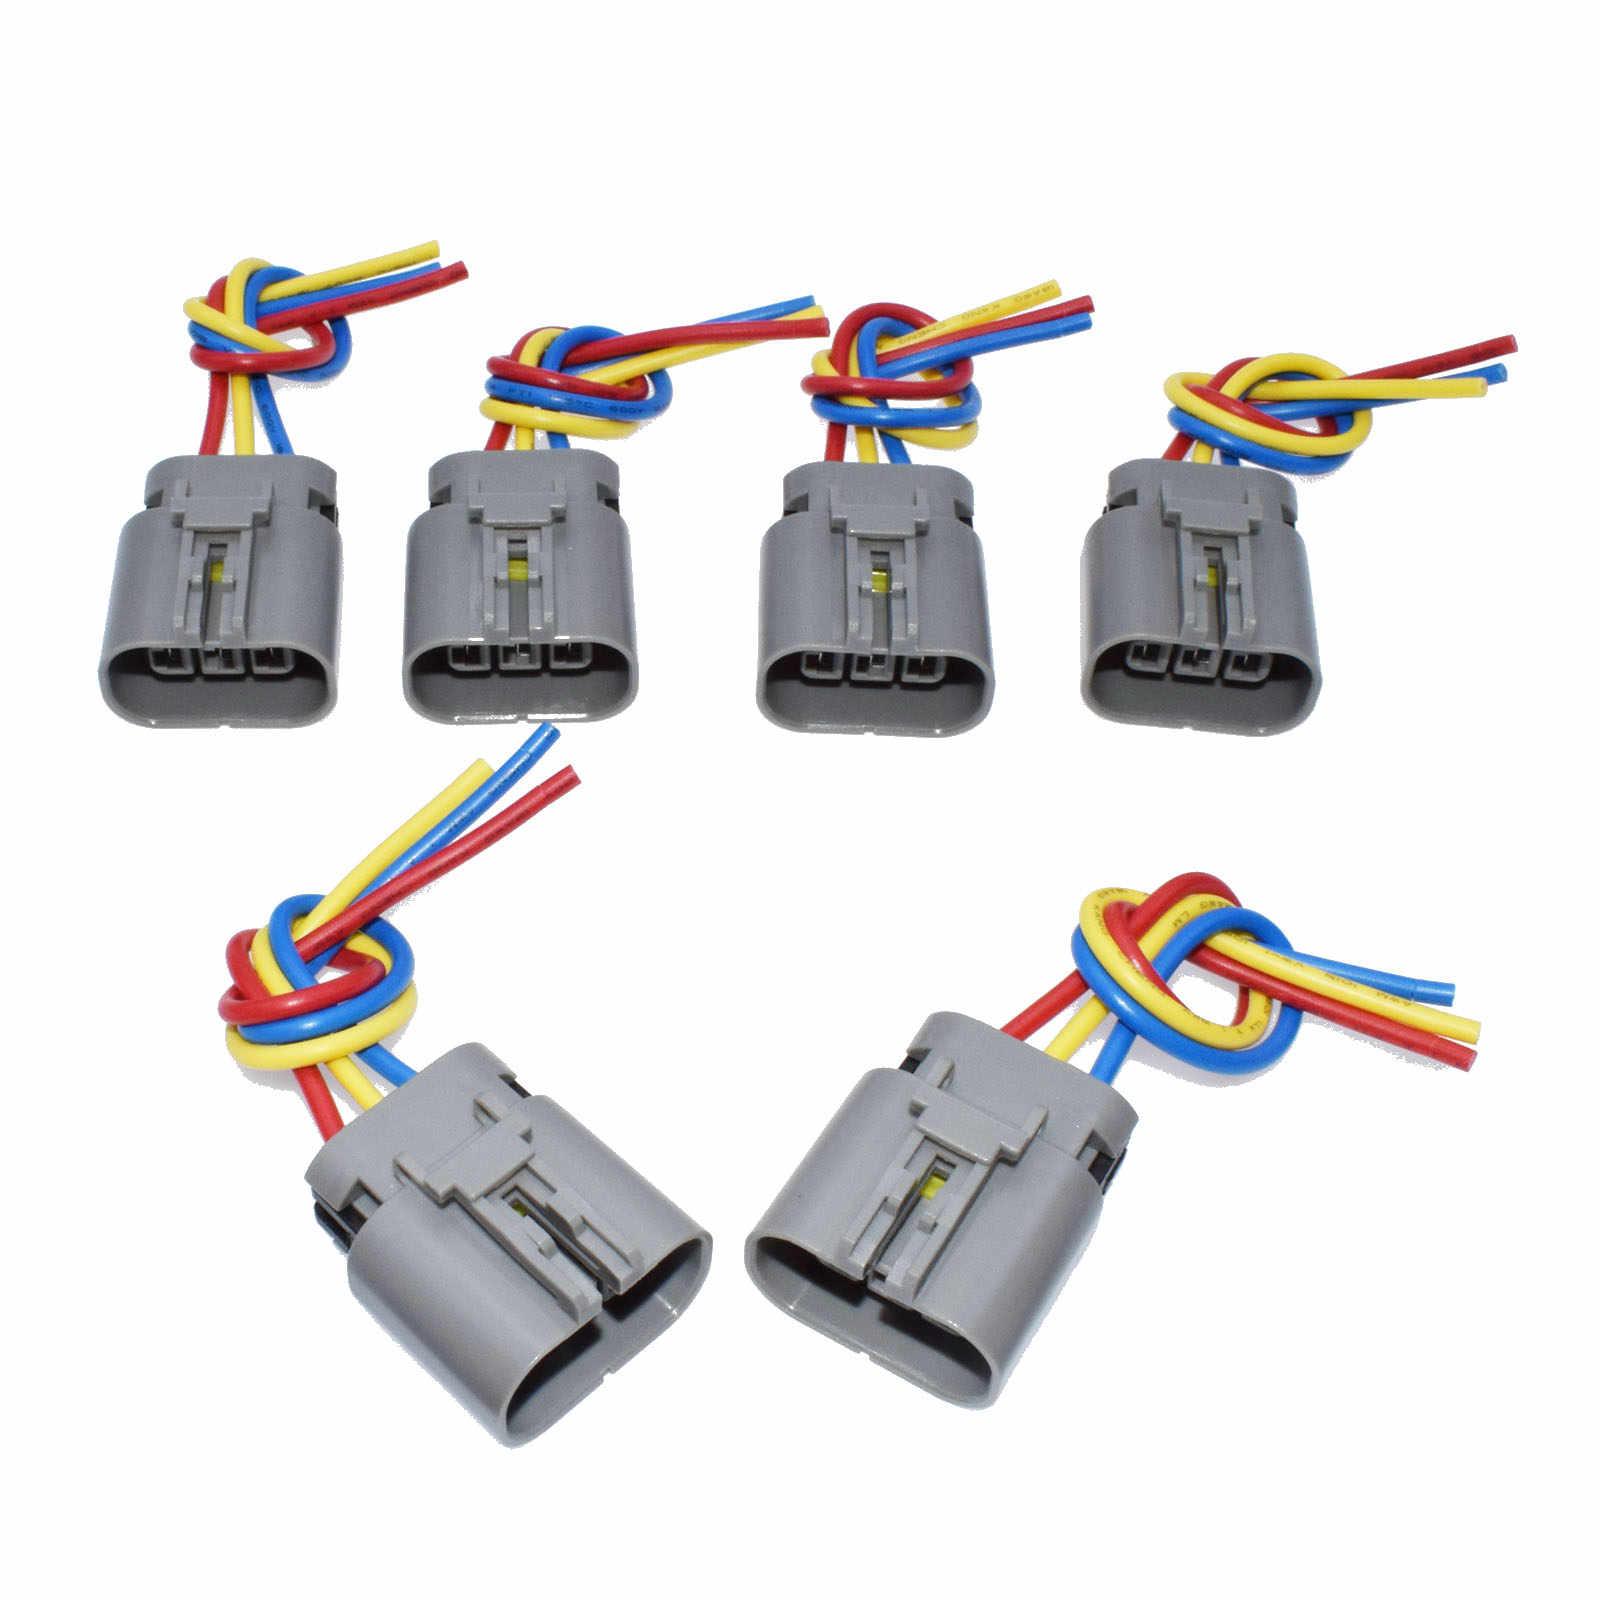 Paquete de bobina de encendido WOLFIGO conector de cableado arnés de cola de cerdo para Nissan 300zx z32 Pulsar NX Infiniti J30 CI-IGN300 CIIGN300